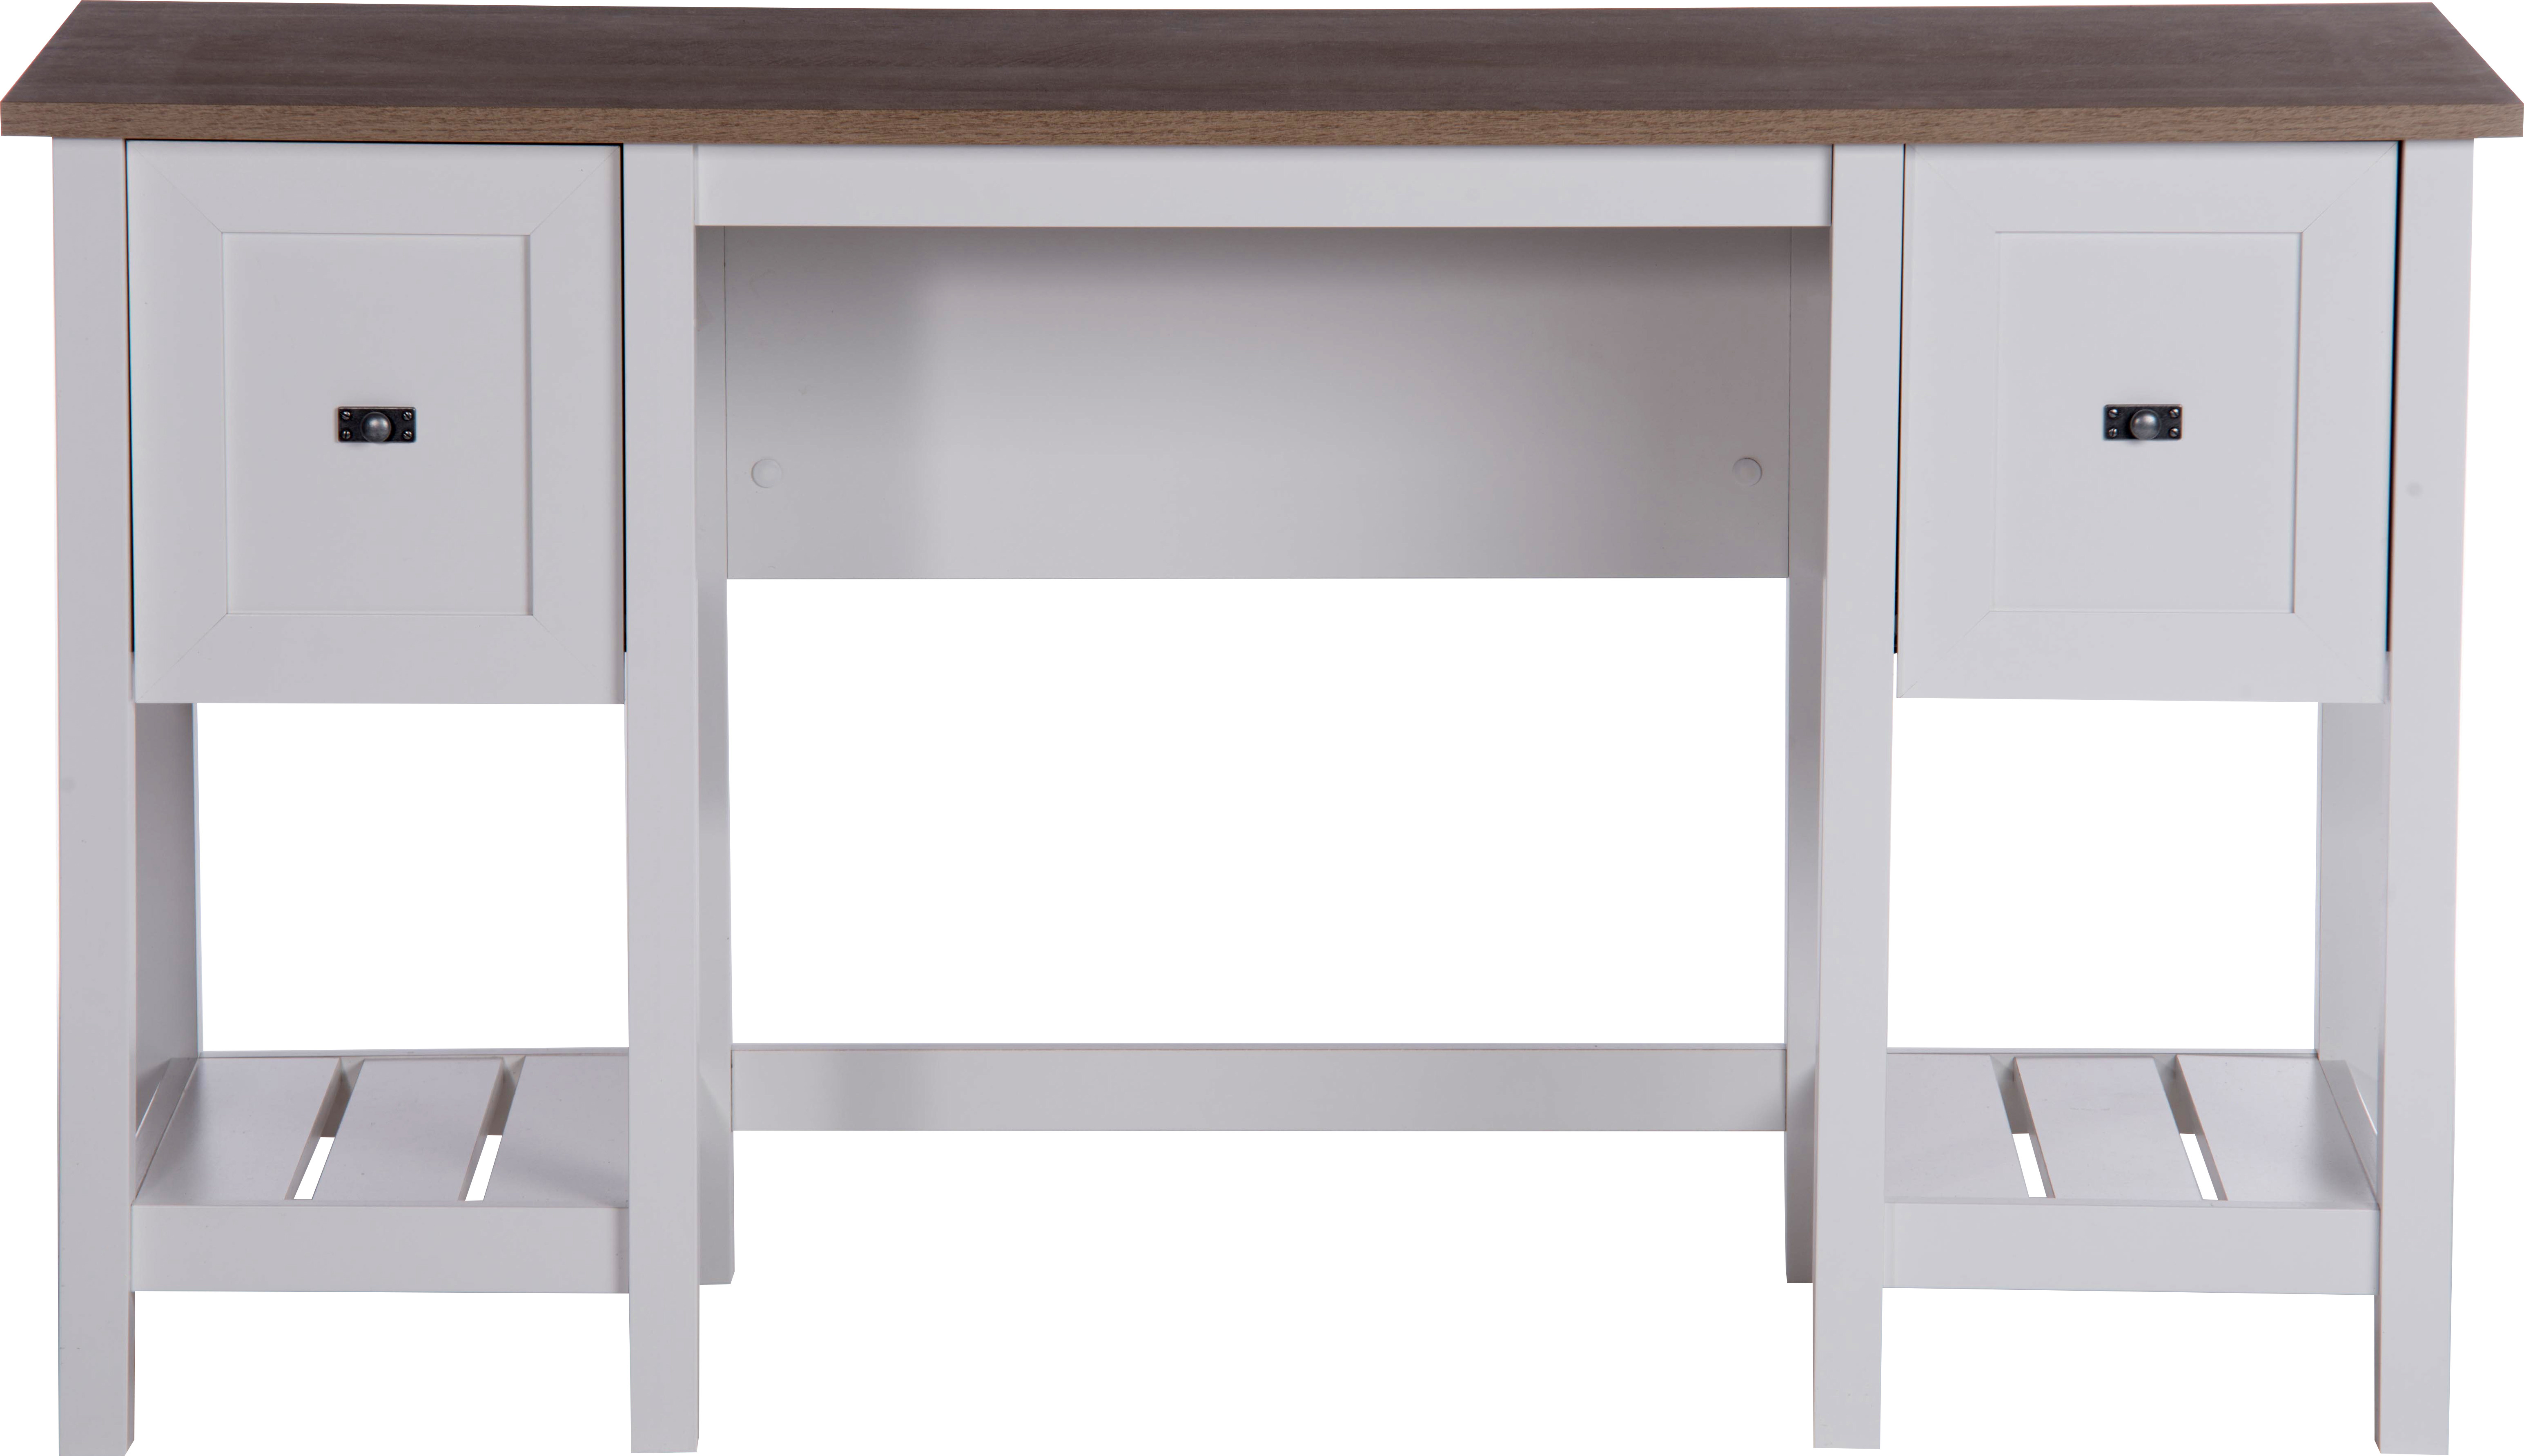 Teknik Office Shaker Style Desk In Soft White Contrasting Lintel Oak Accent Desktop One Letter Sized Filing Drawer And Shelf Storage